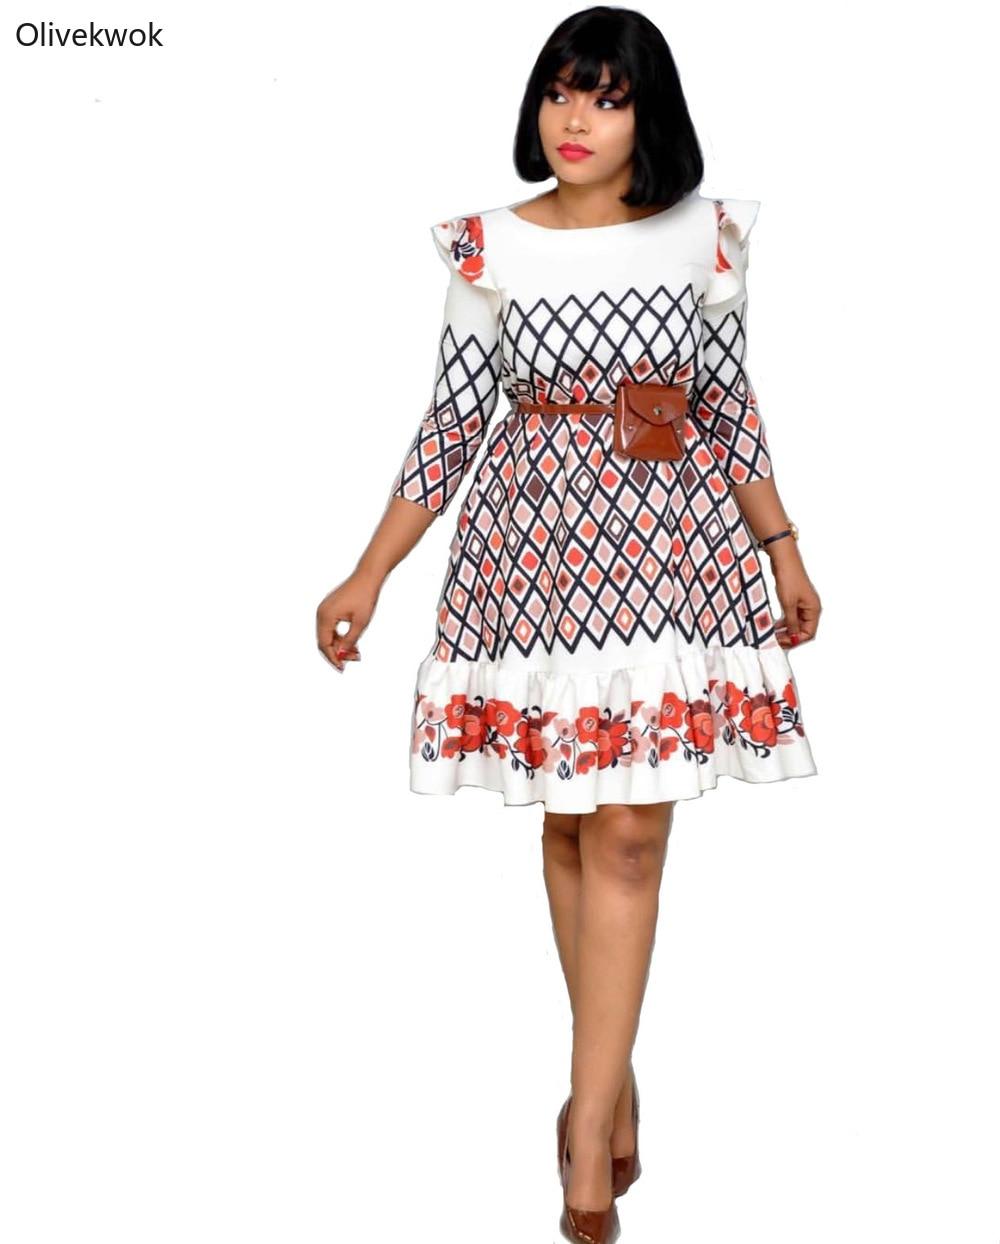 Olivekwok African Dresses for Women Casual O-Neck Half Sleeve Print with Small Waist Bag Decoration Big Swing Mini Dress AM348